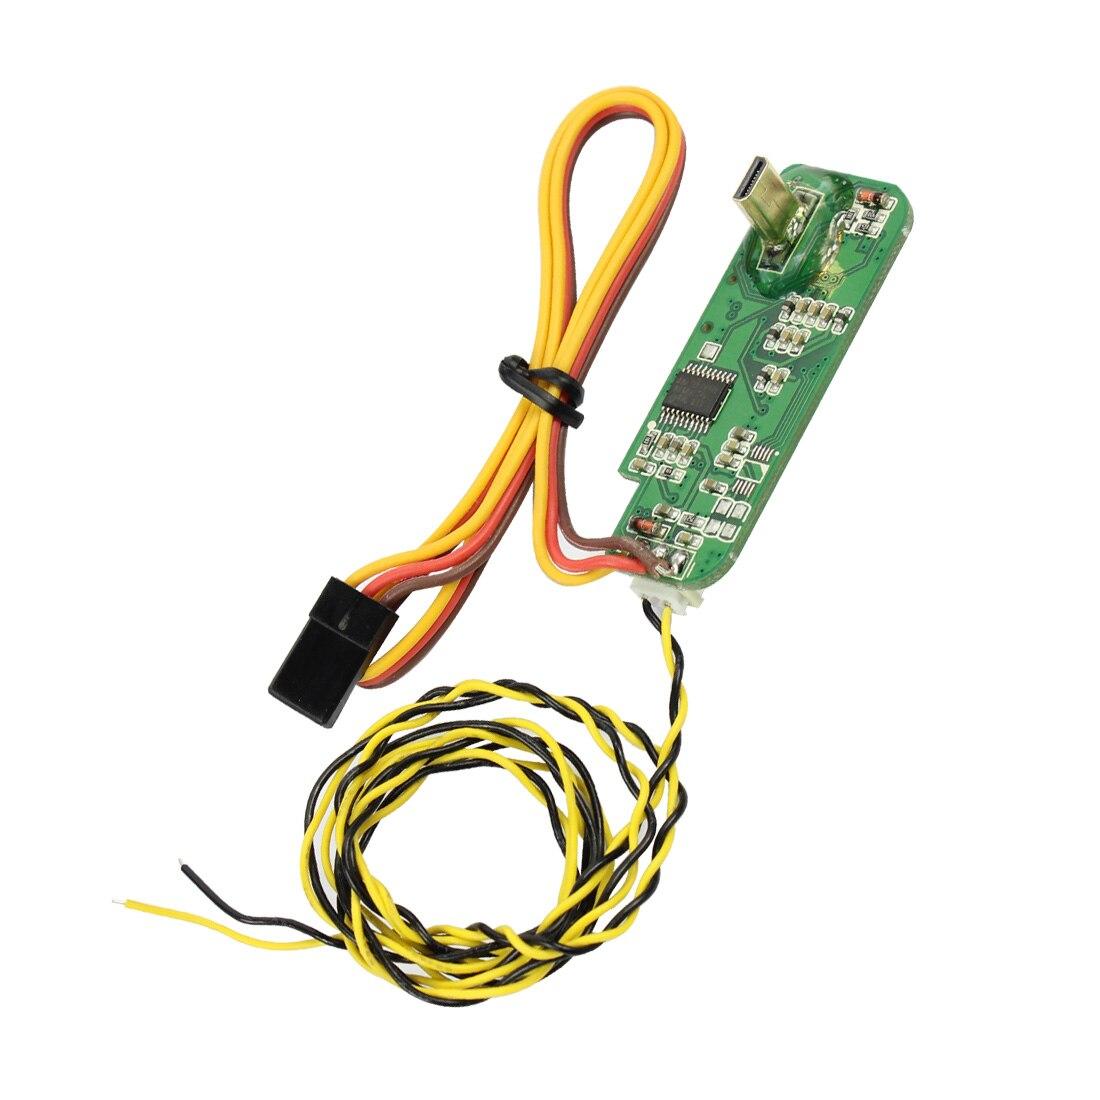 F08820 Aerial FPV Micro HDMI to AV Analog Signal Converter Adapter Board for Sony A5000 6000 Camera + FSF08820 Aerial FPV Micro HDMI to AV Analog Signal Converter Adapter Board for Sony A5000 6000 Camera + FS